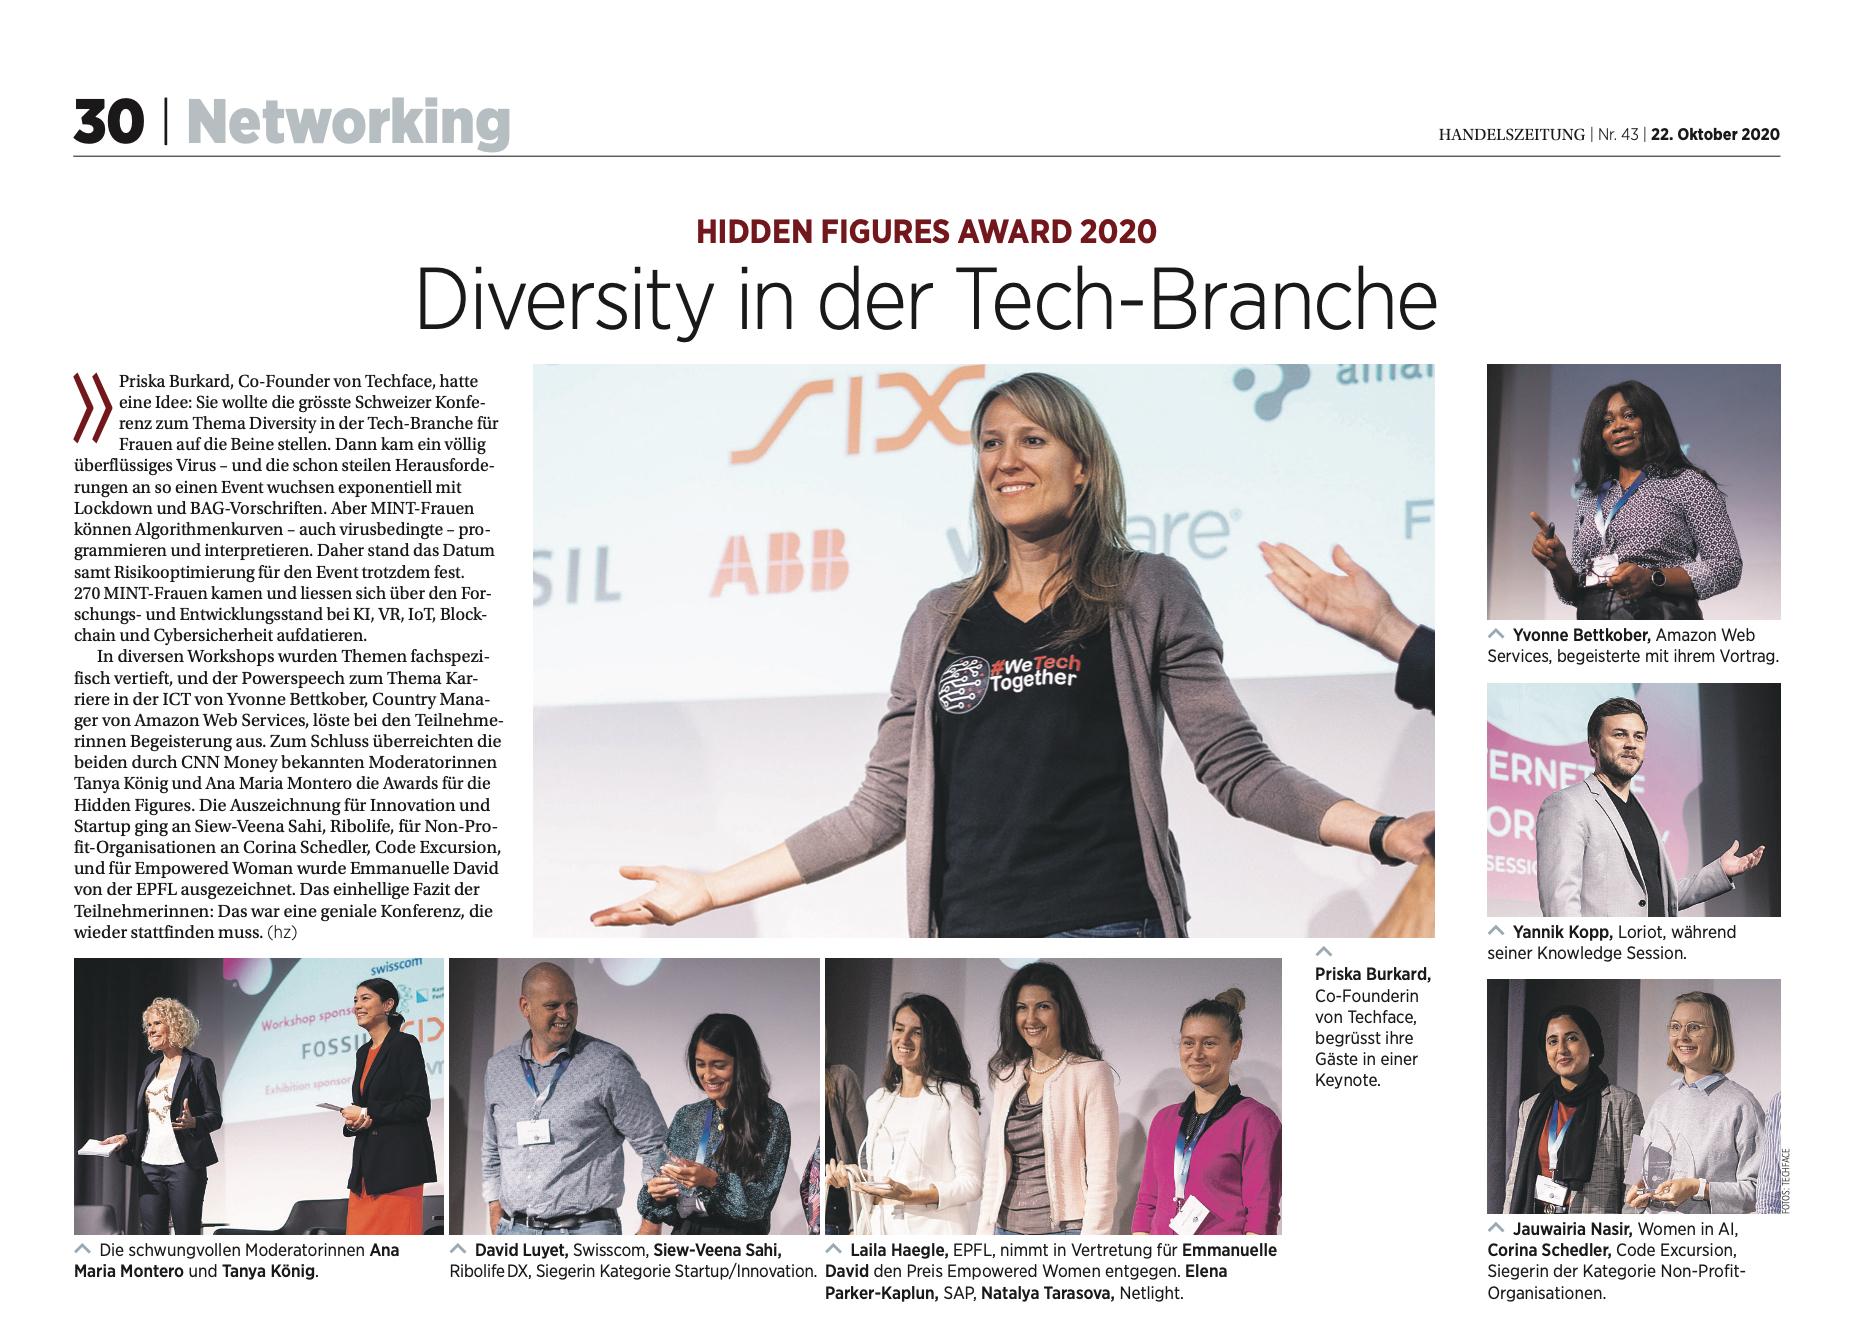 #wetechtogether article in the Handelszeitung